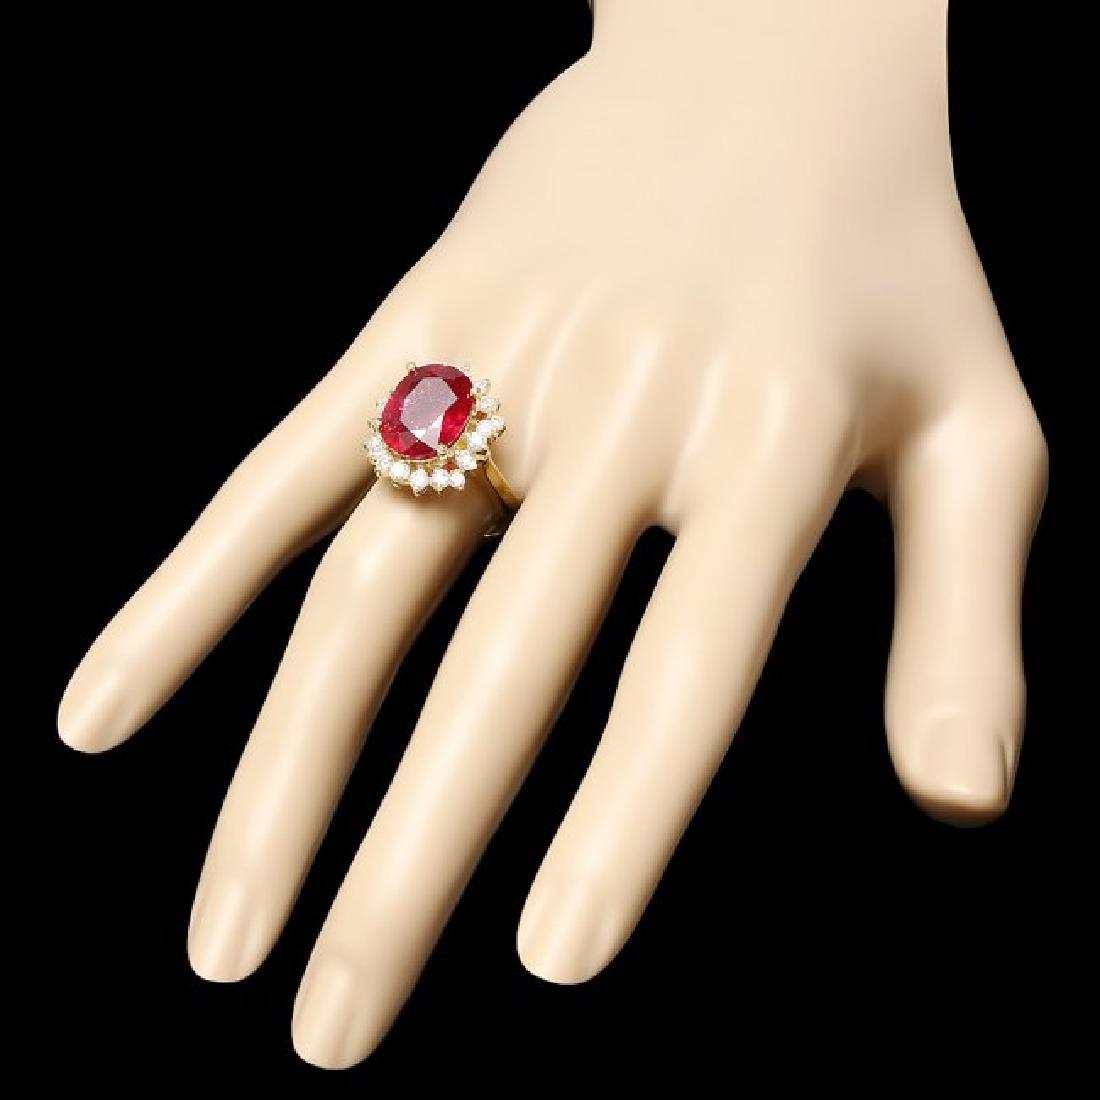 14k Yellow Gold 7.50ct Ruby 1.00ct Diamond Ring - 3